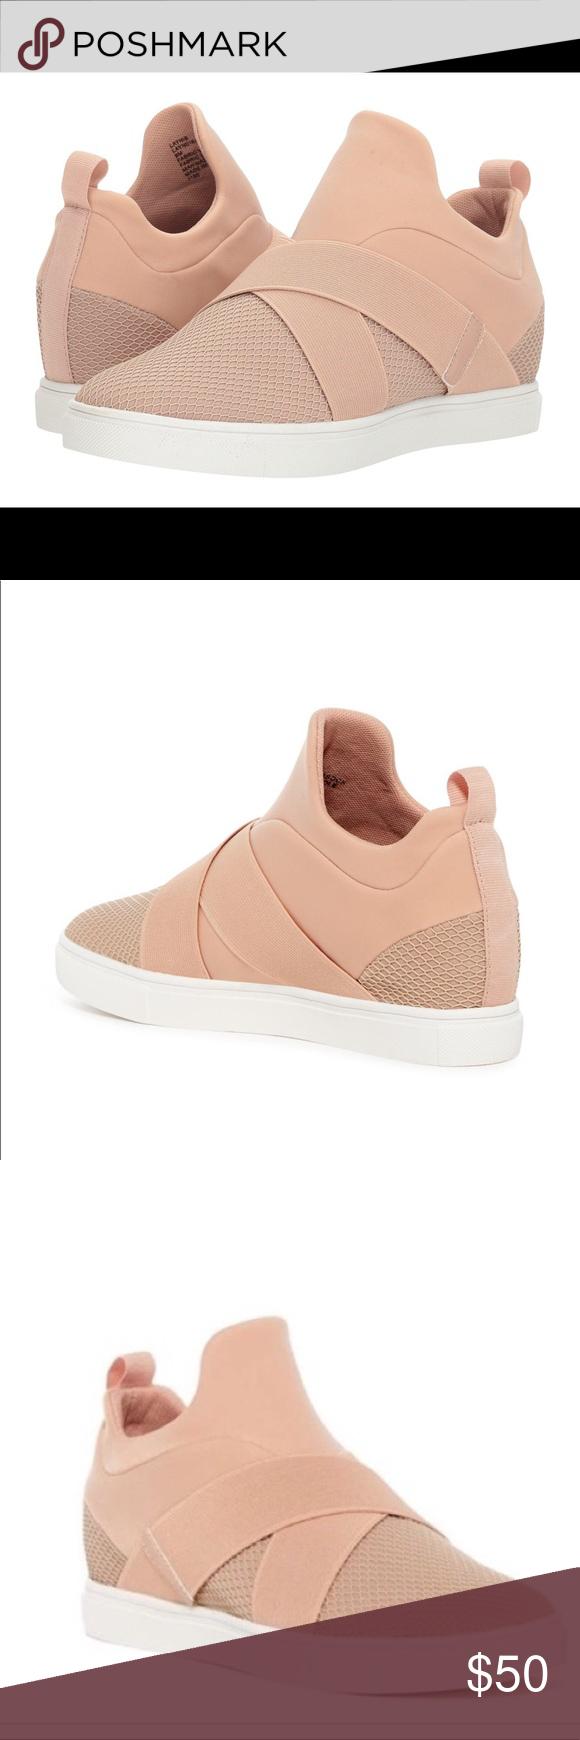 2765ae9910b Steve Madden Laynie Wedge Sneaker pink Crossover elastic straps ...